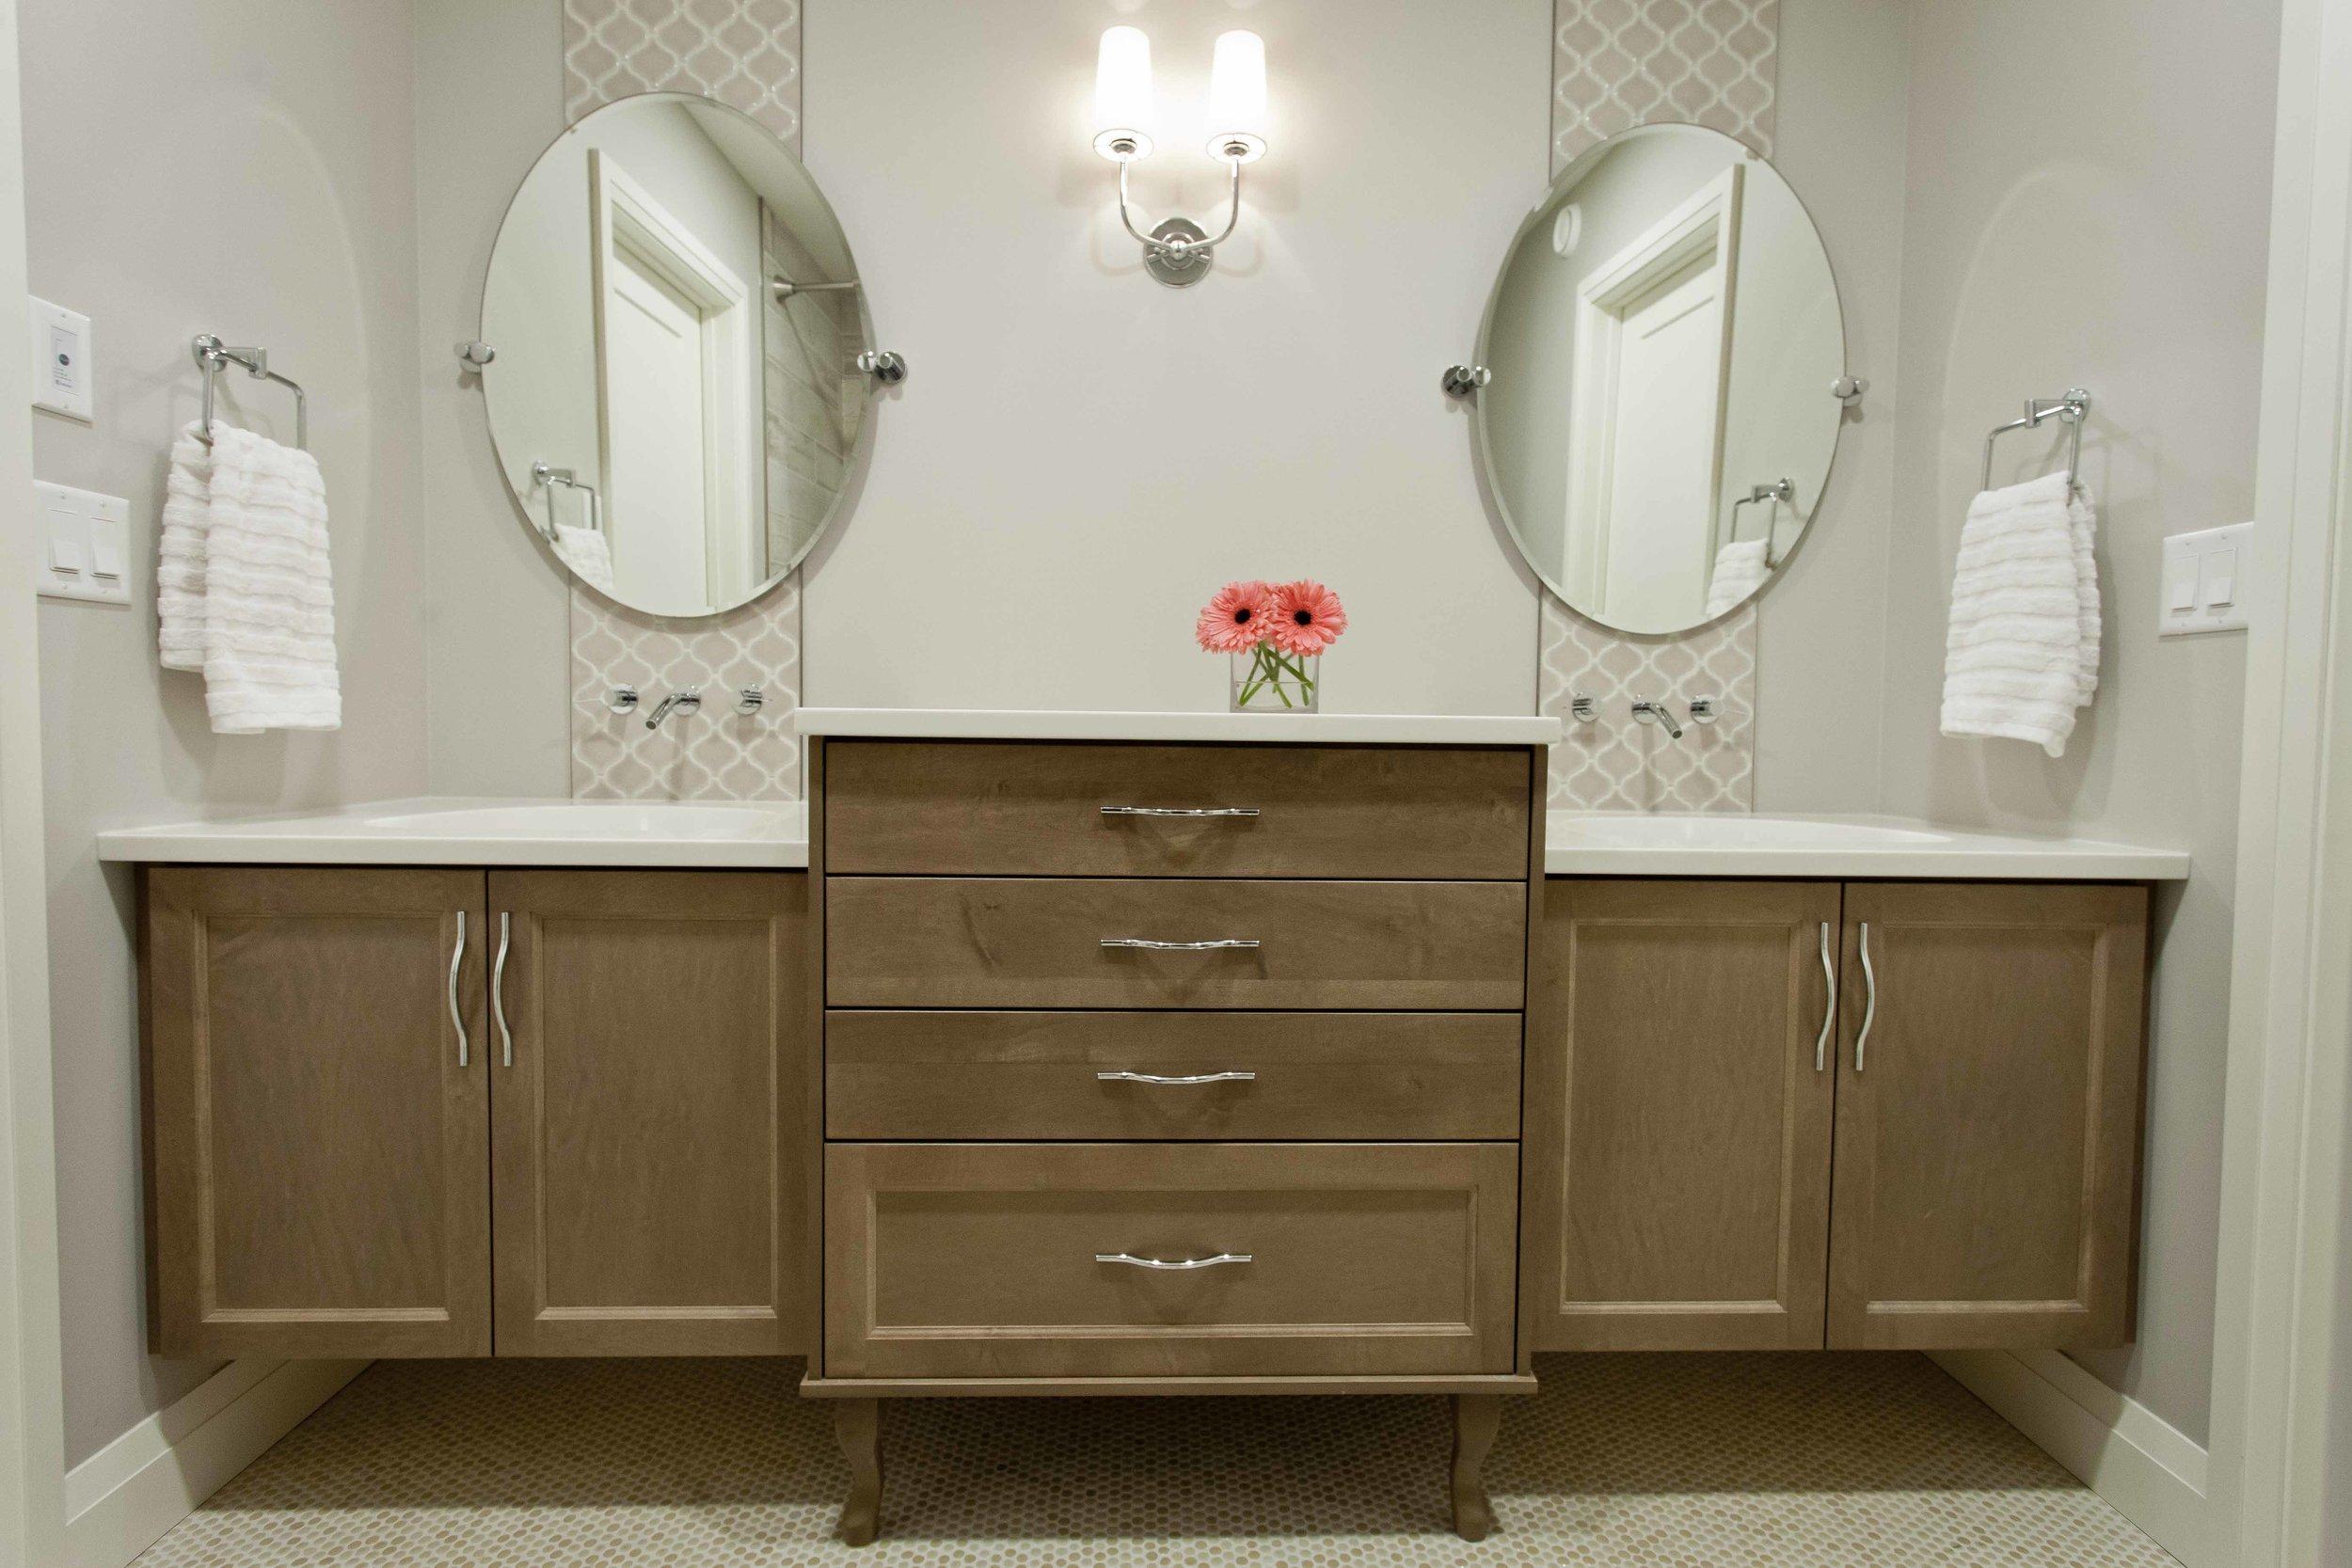 Workshop Cabinets & Design Camrose Alberta Interior Design and Cabinetry Bathroom Design Jack and Jill Custom Vanity and Sink